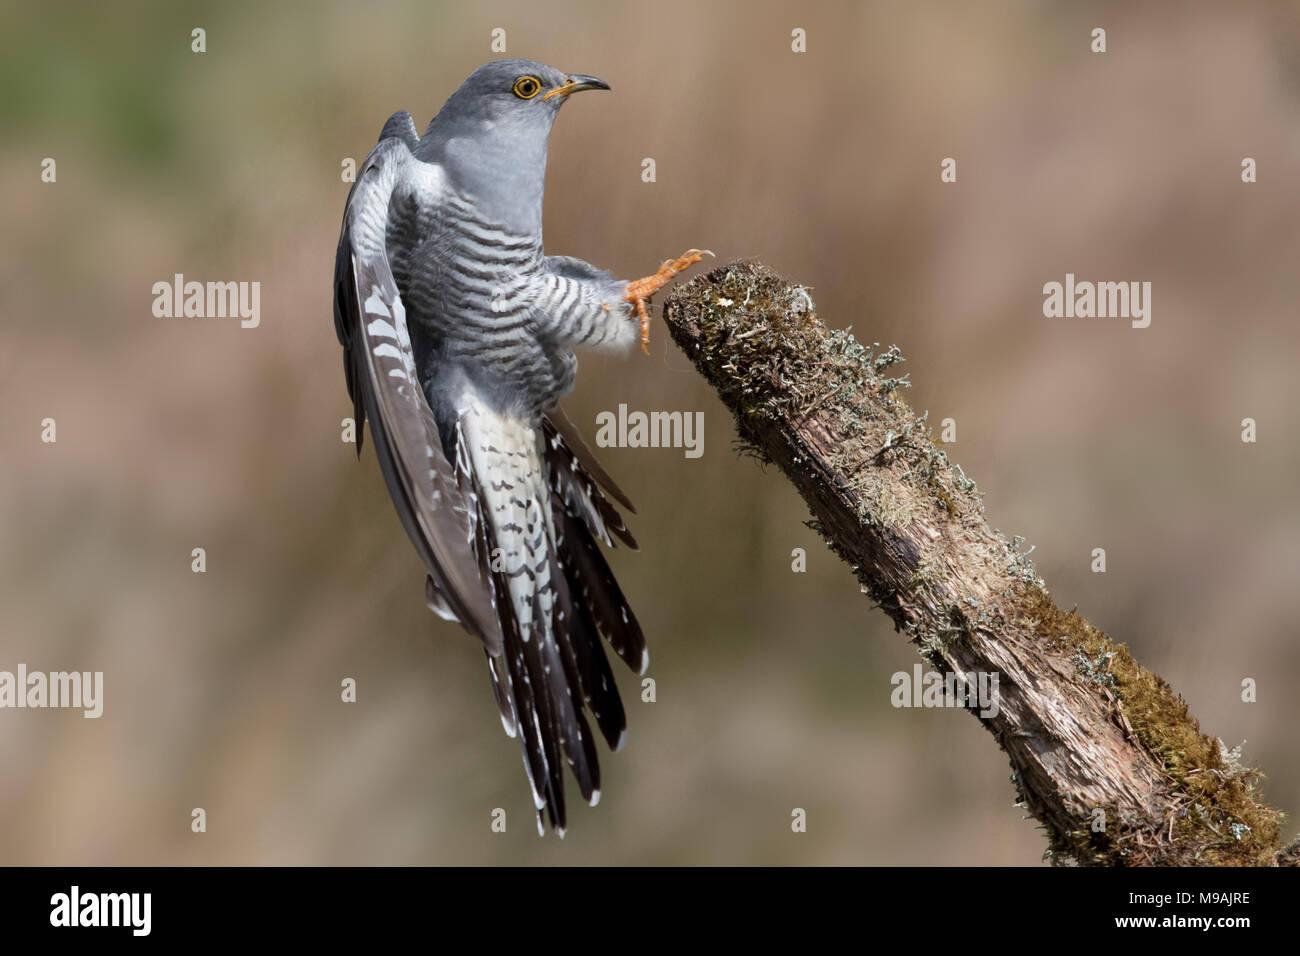 Cuckoo  landing on dead branch - Stock Image